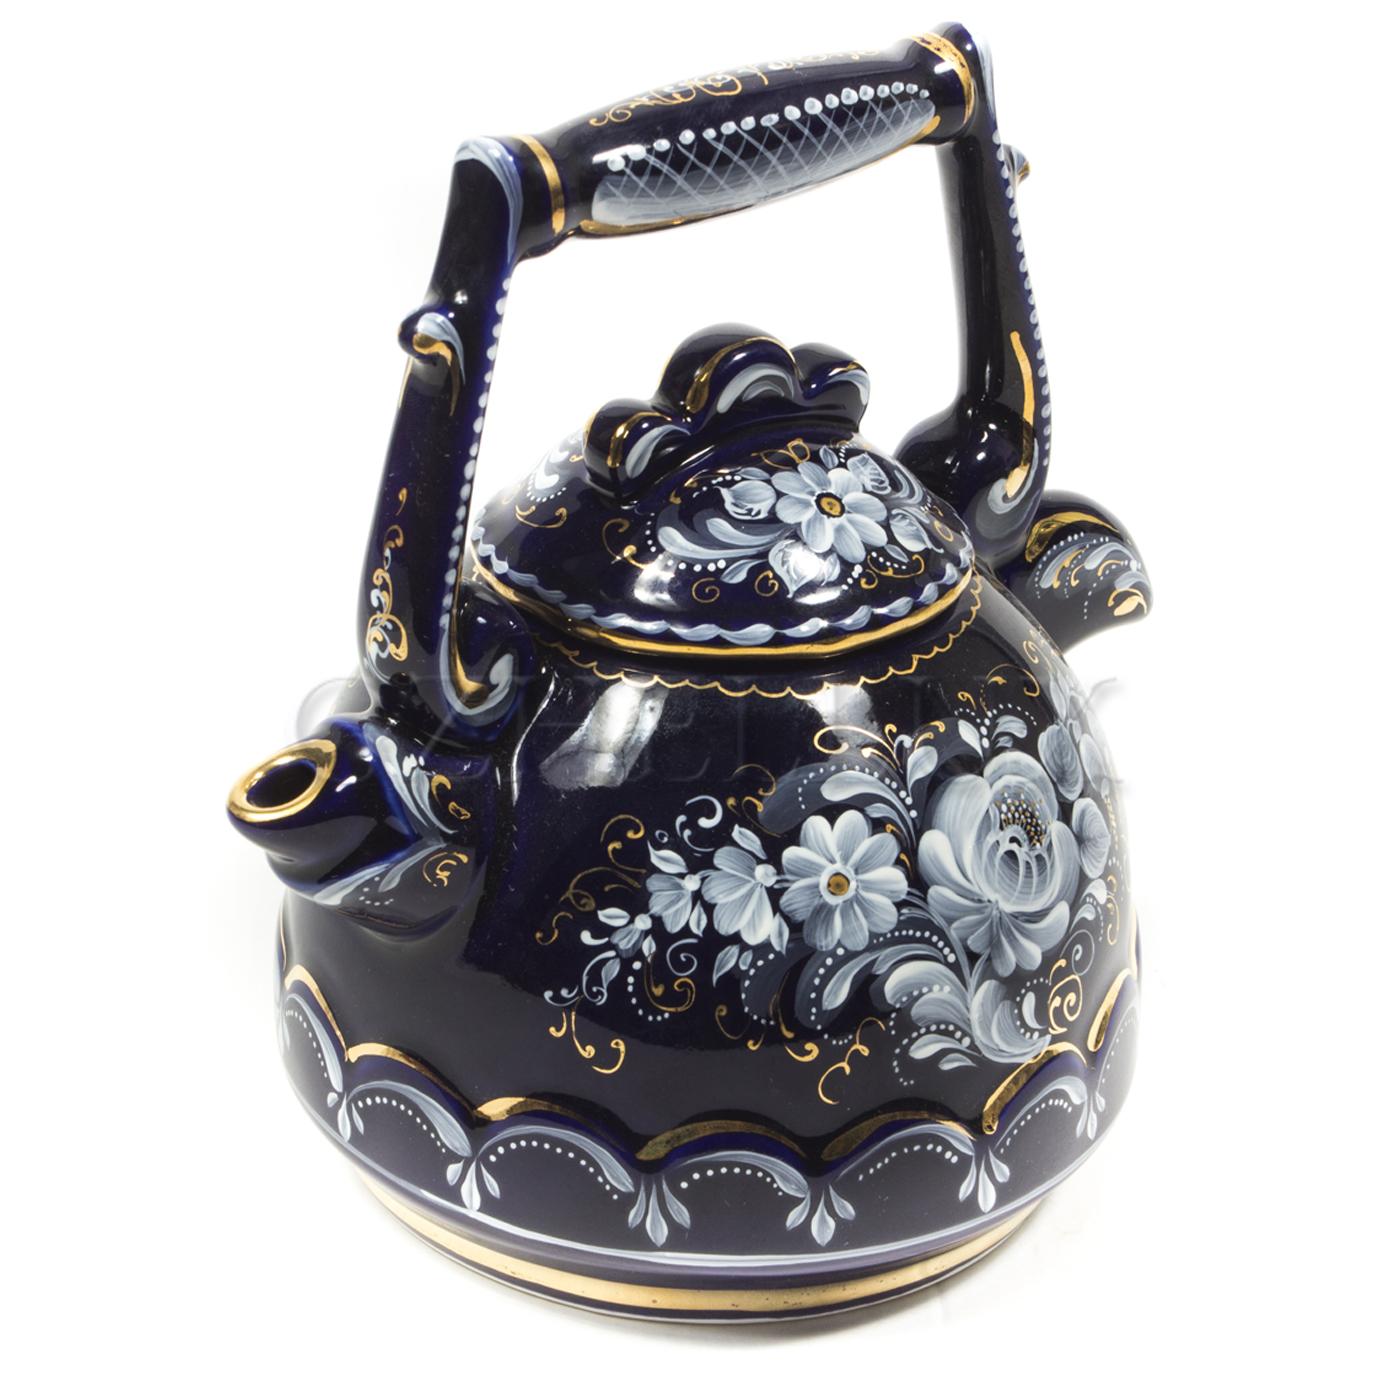 Чайник «Петушок» (глухой кобальт)